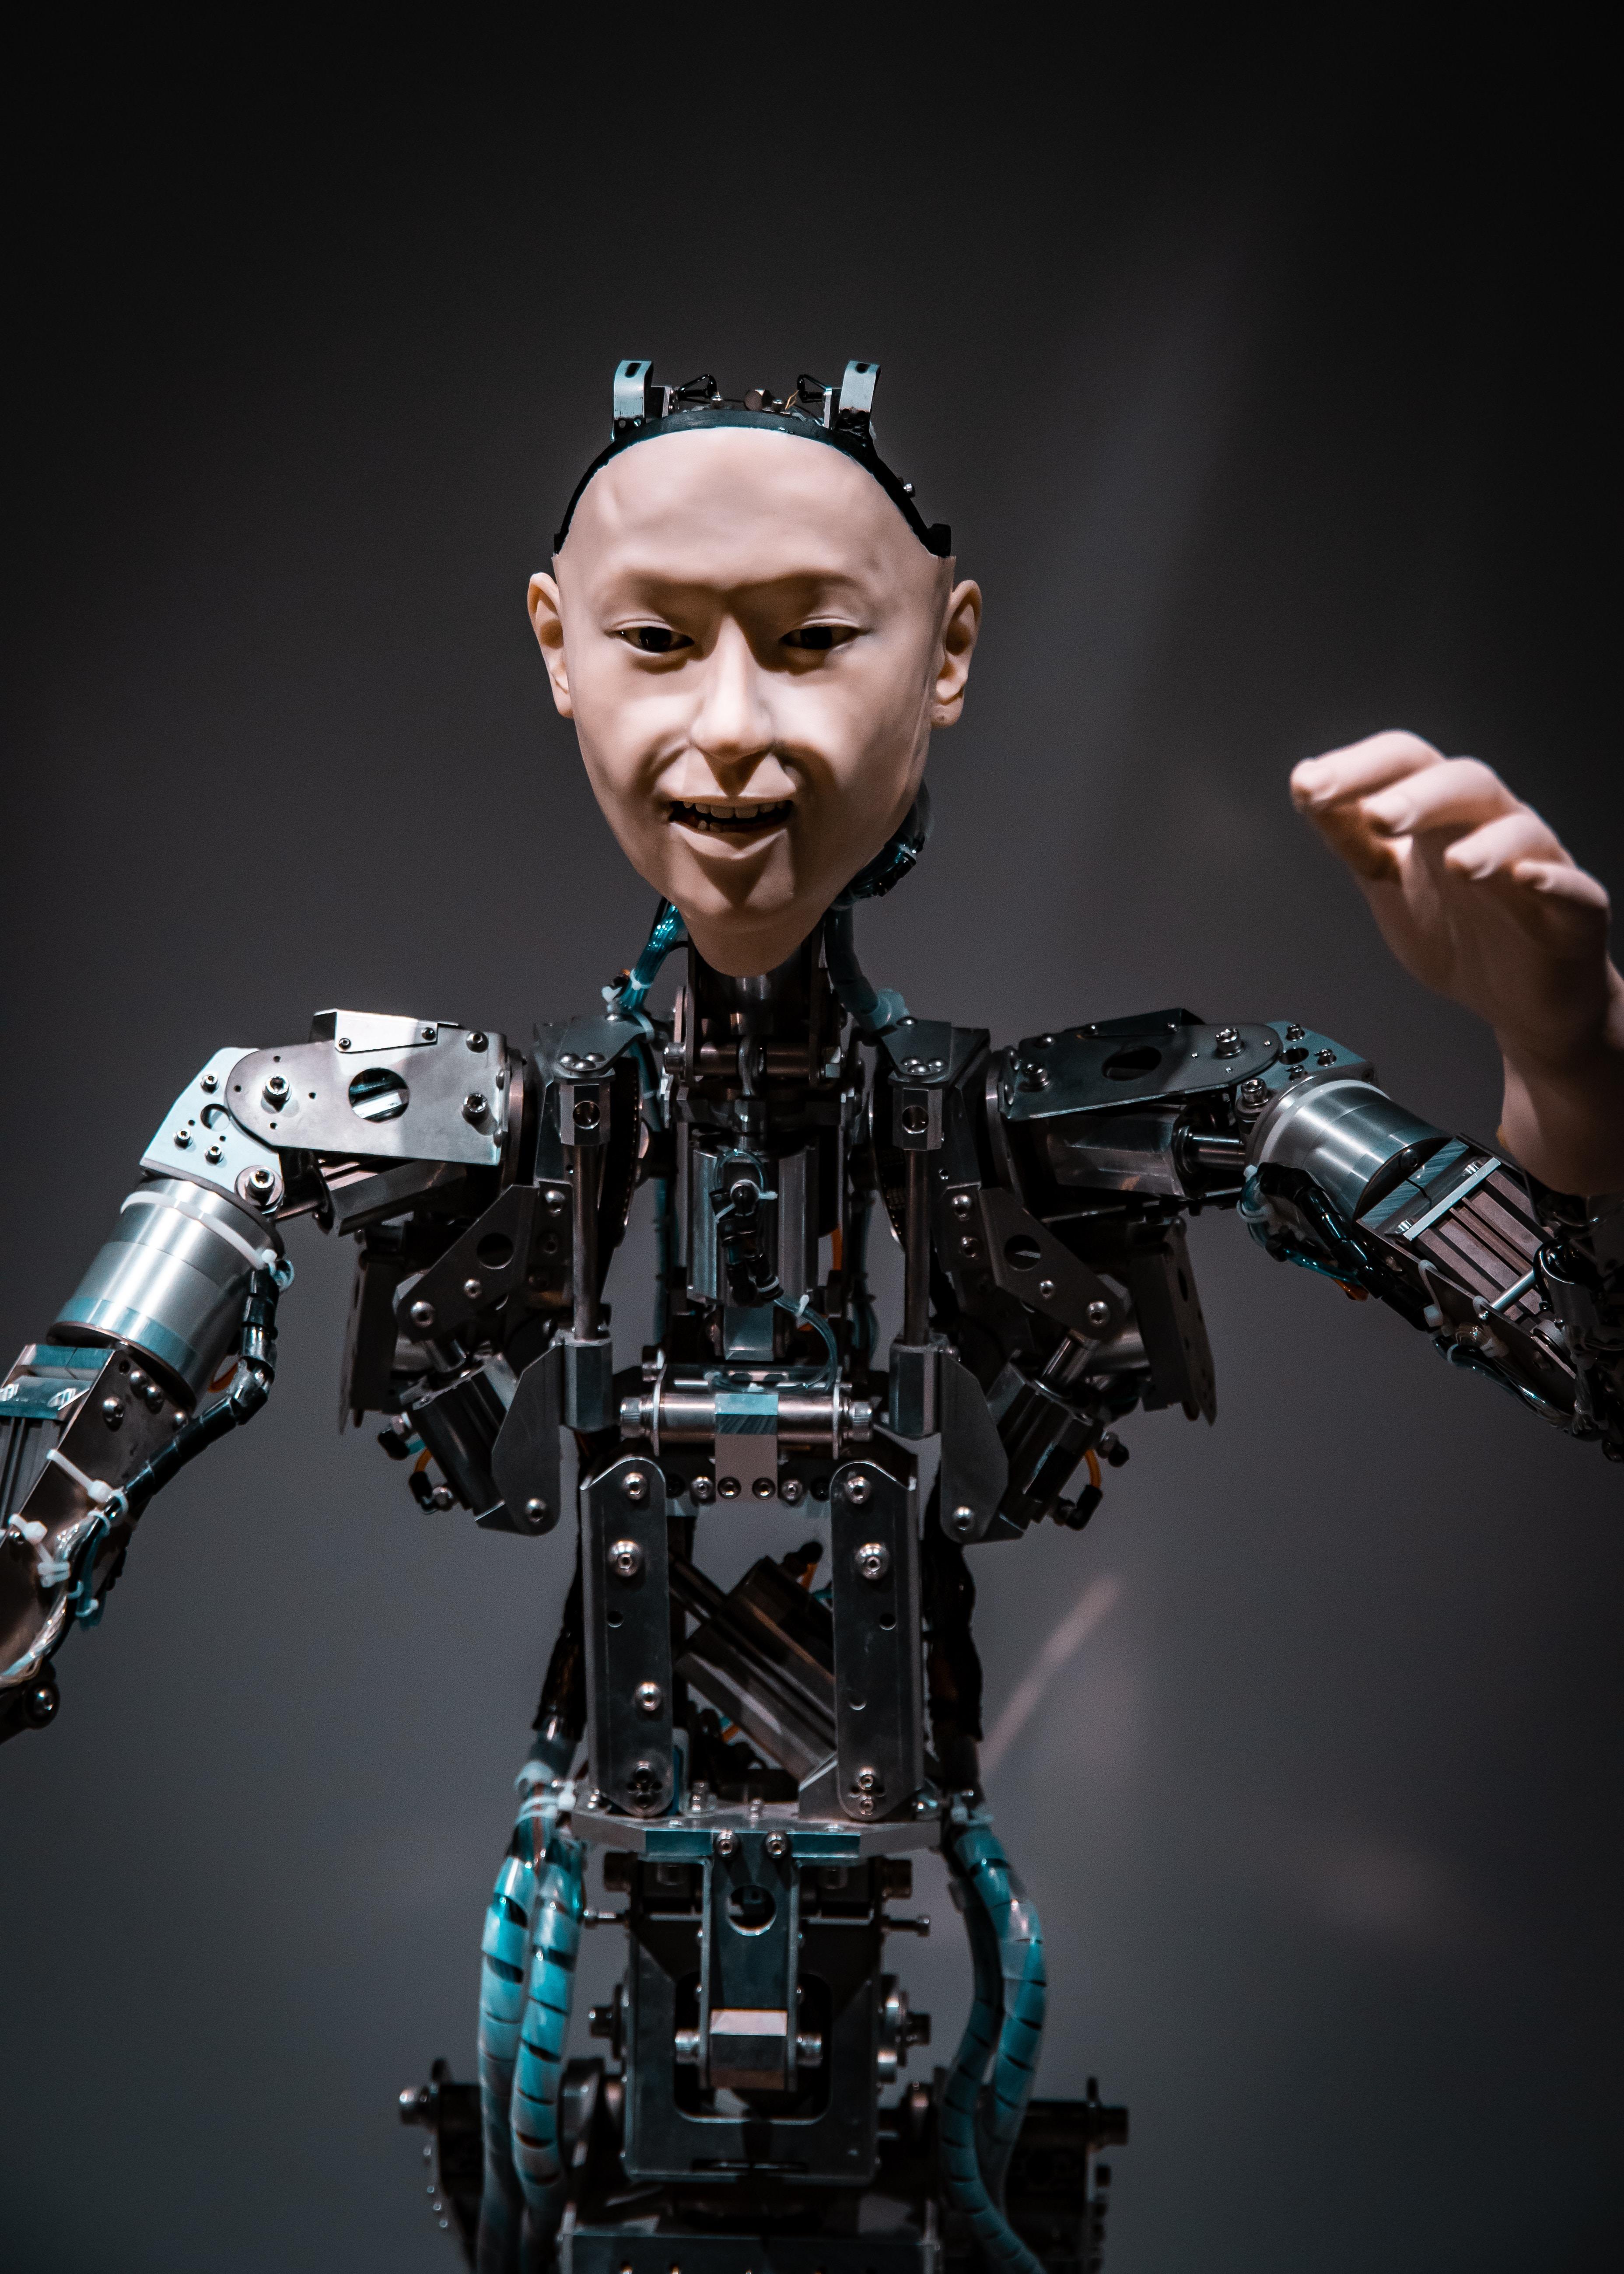 W5 - Artificial Intelligence (AI)